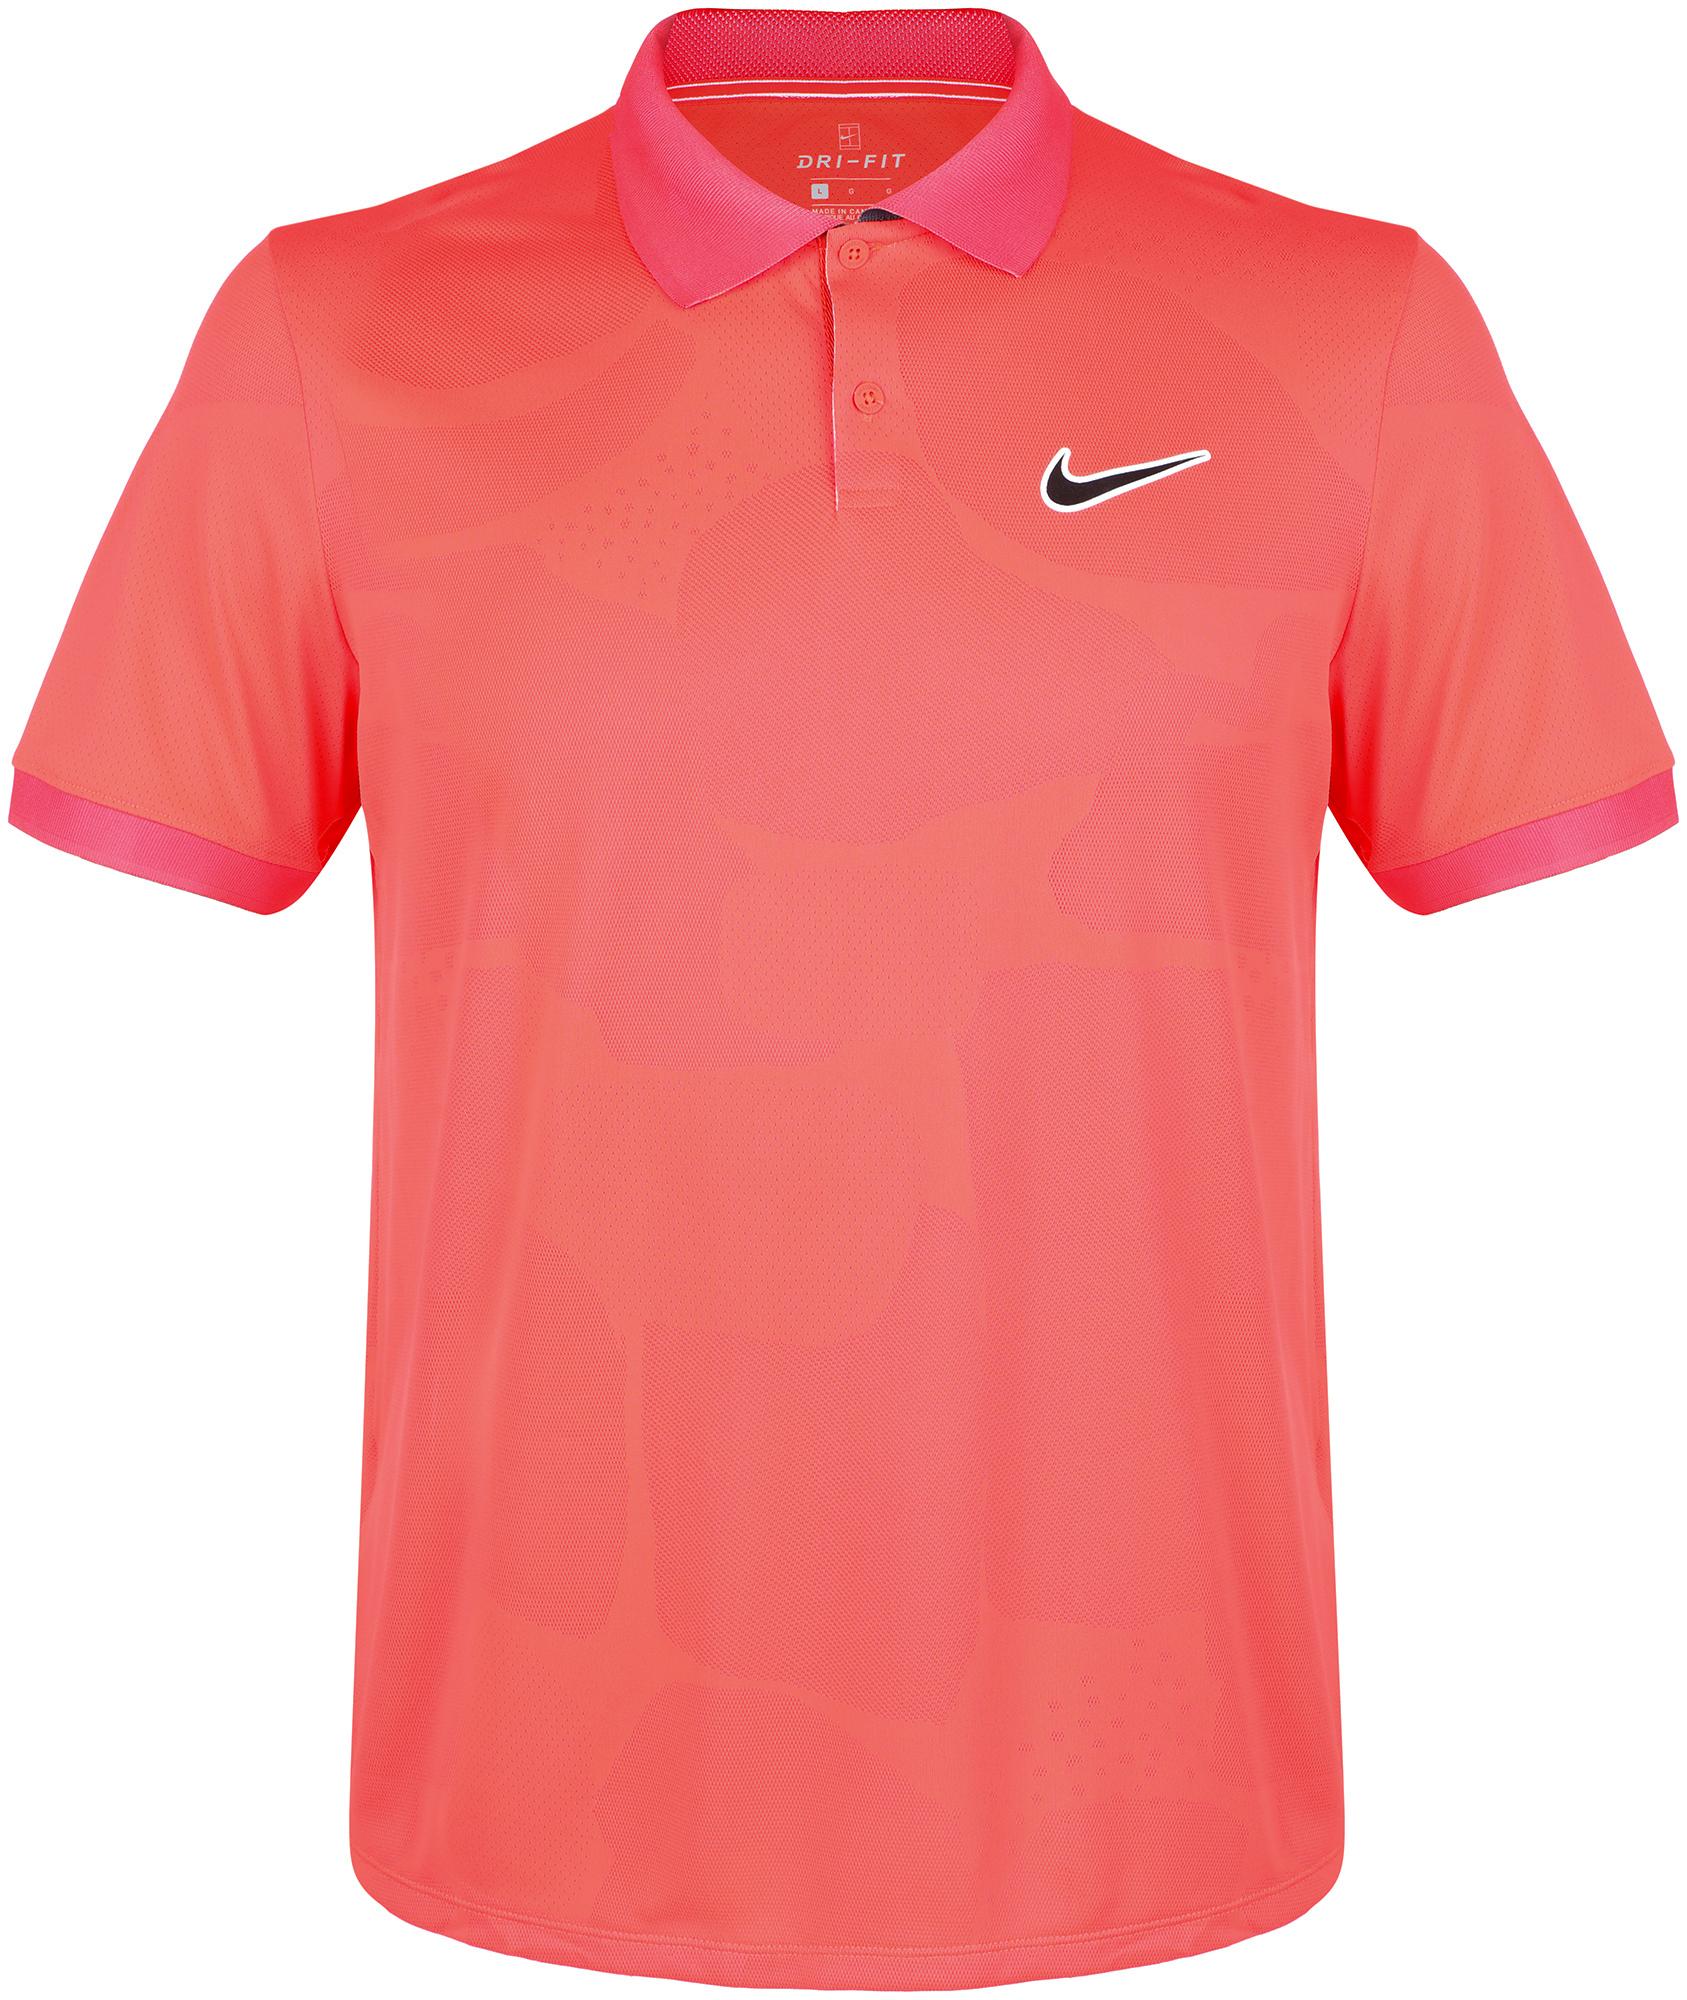 Nike Поло мужское Nike Court Breathe Advantage, размер 50-52 поло мужское rav цвет коричневый белый rav01 021 размер xl 52